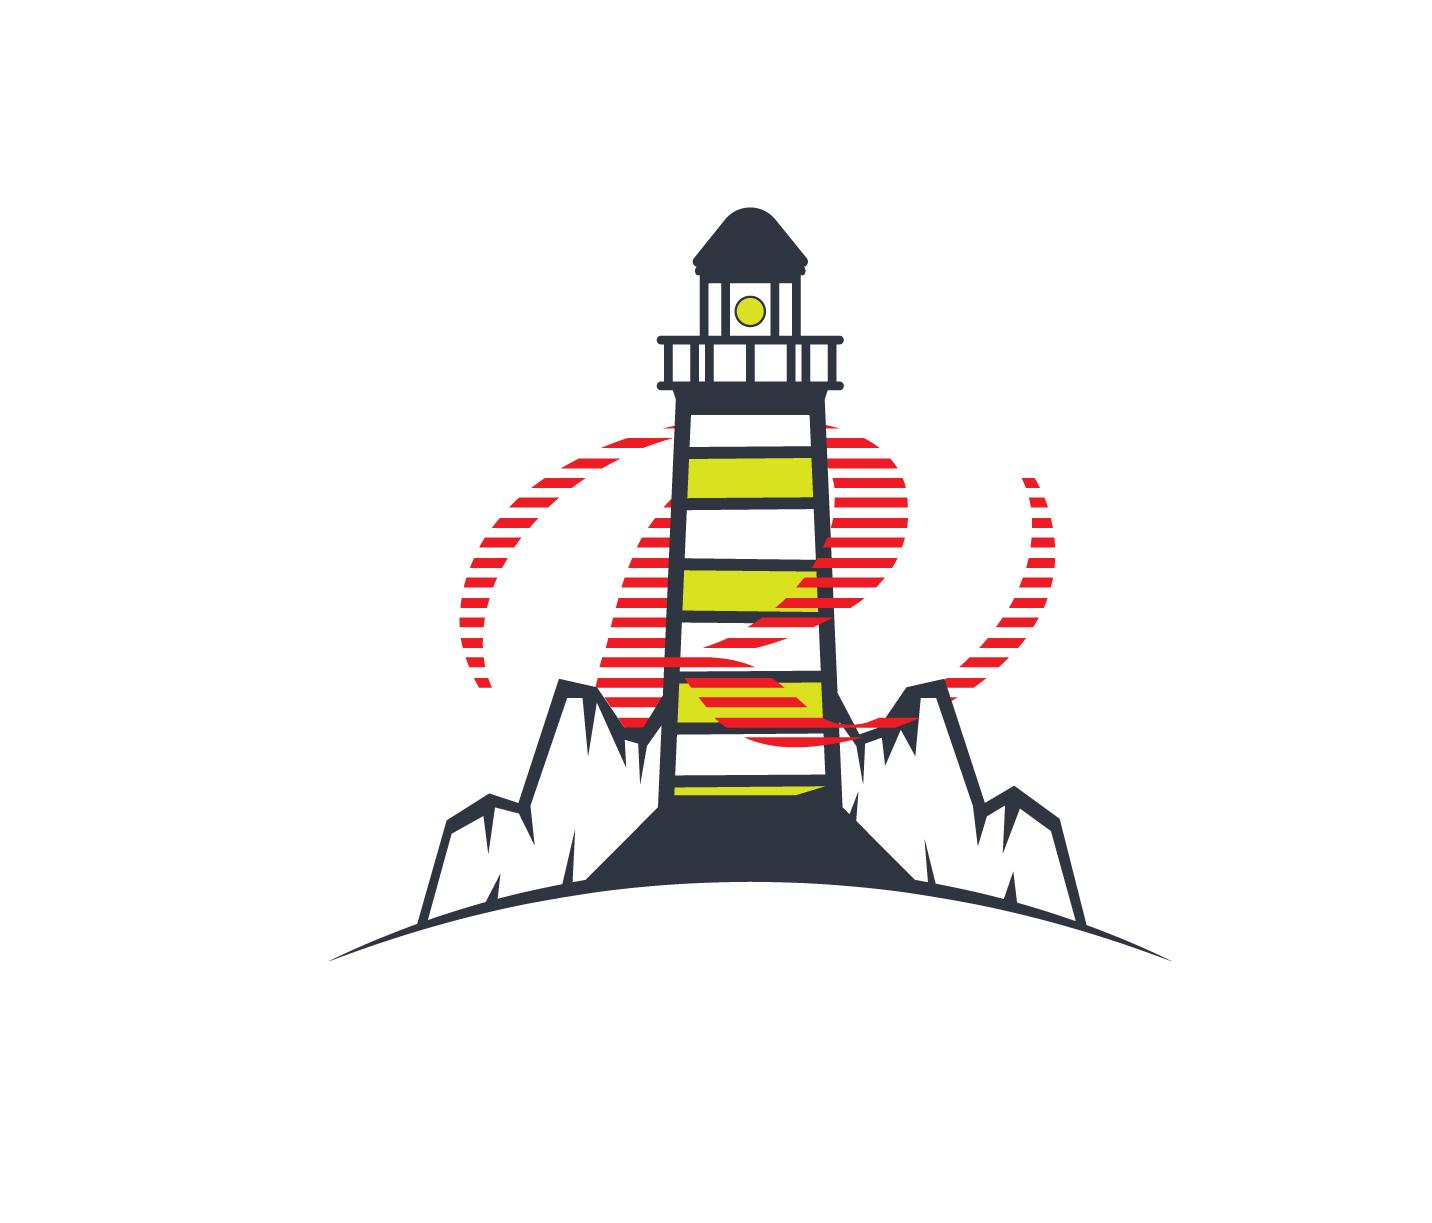 Разработка логотипа корпоративной парусной регаты фото f_0545c10fbffc587e.jpg